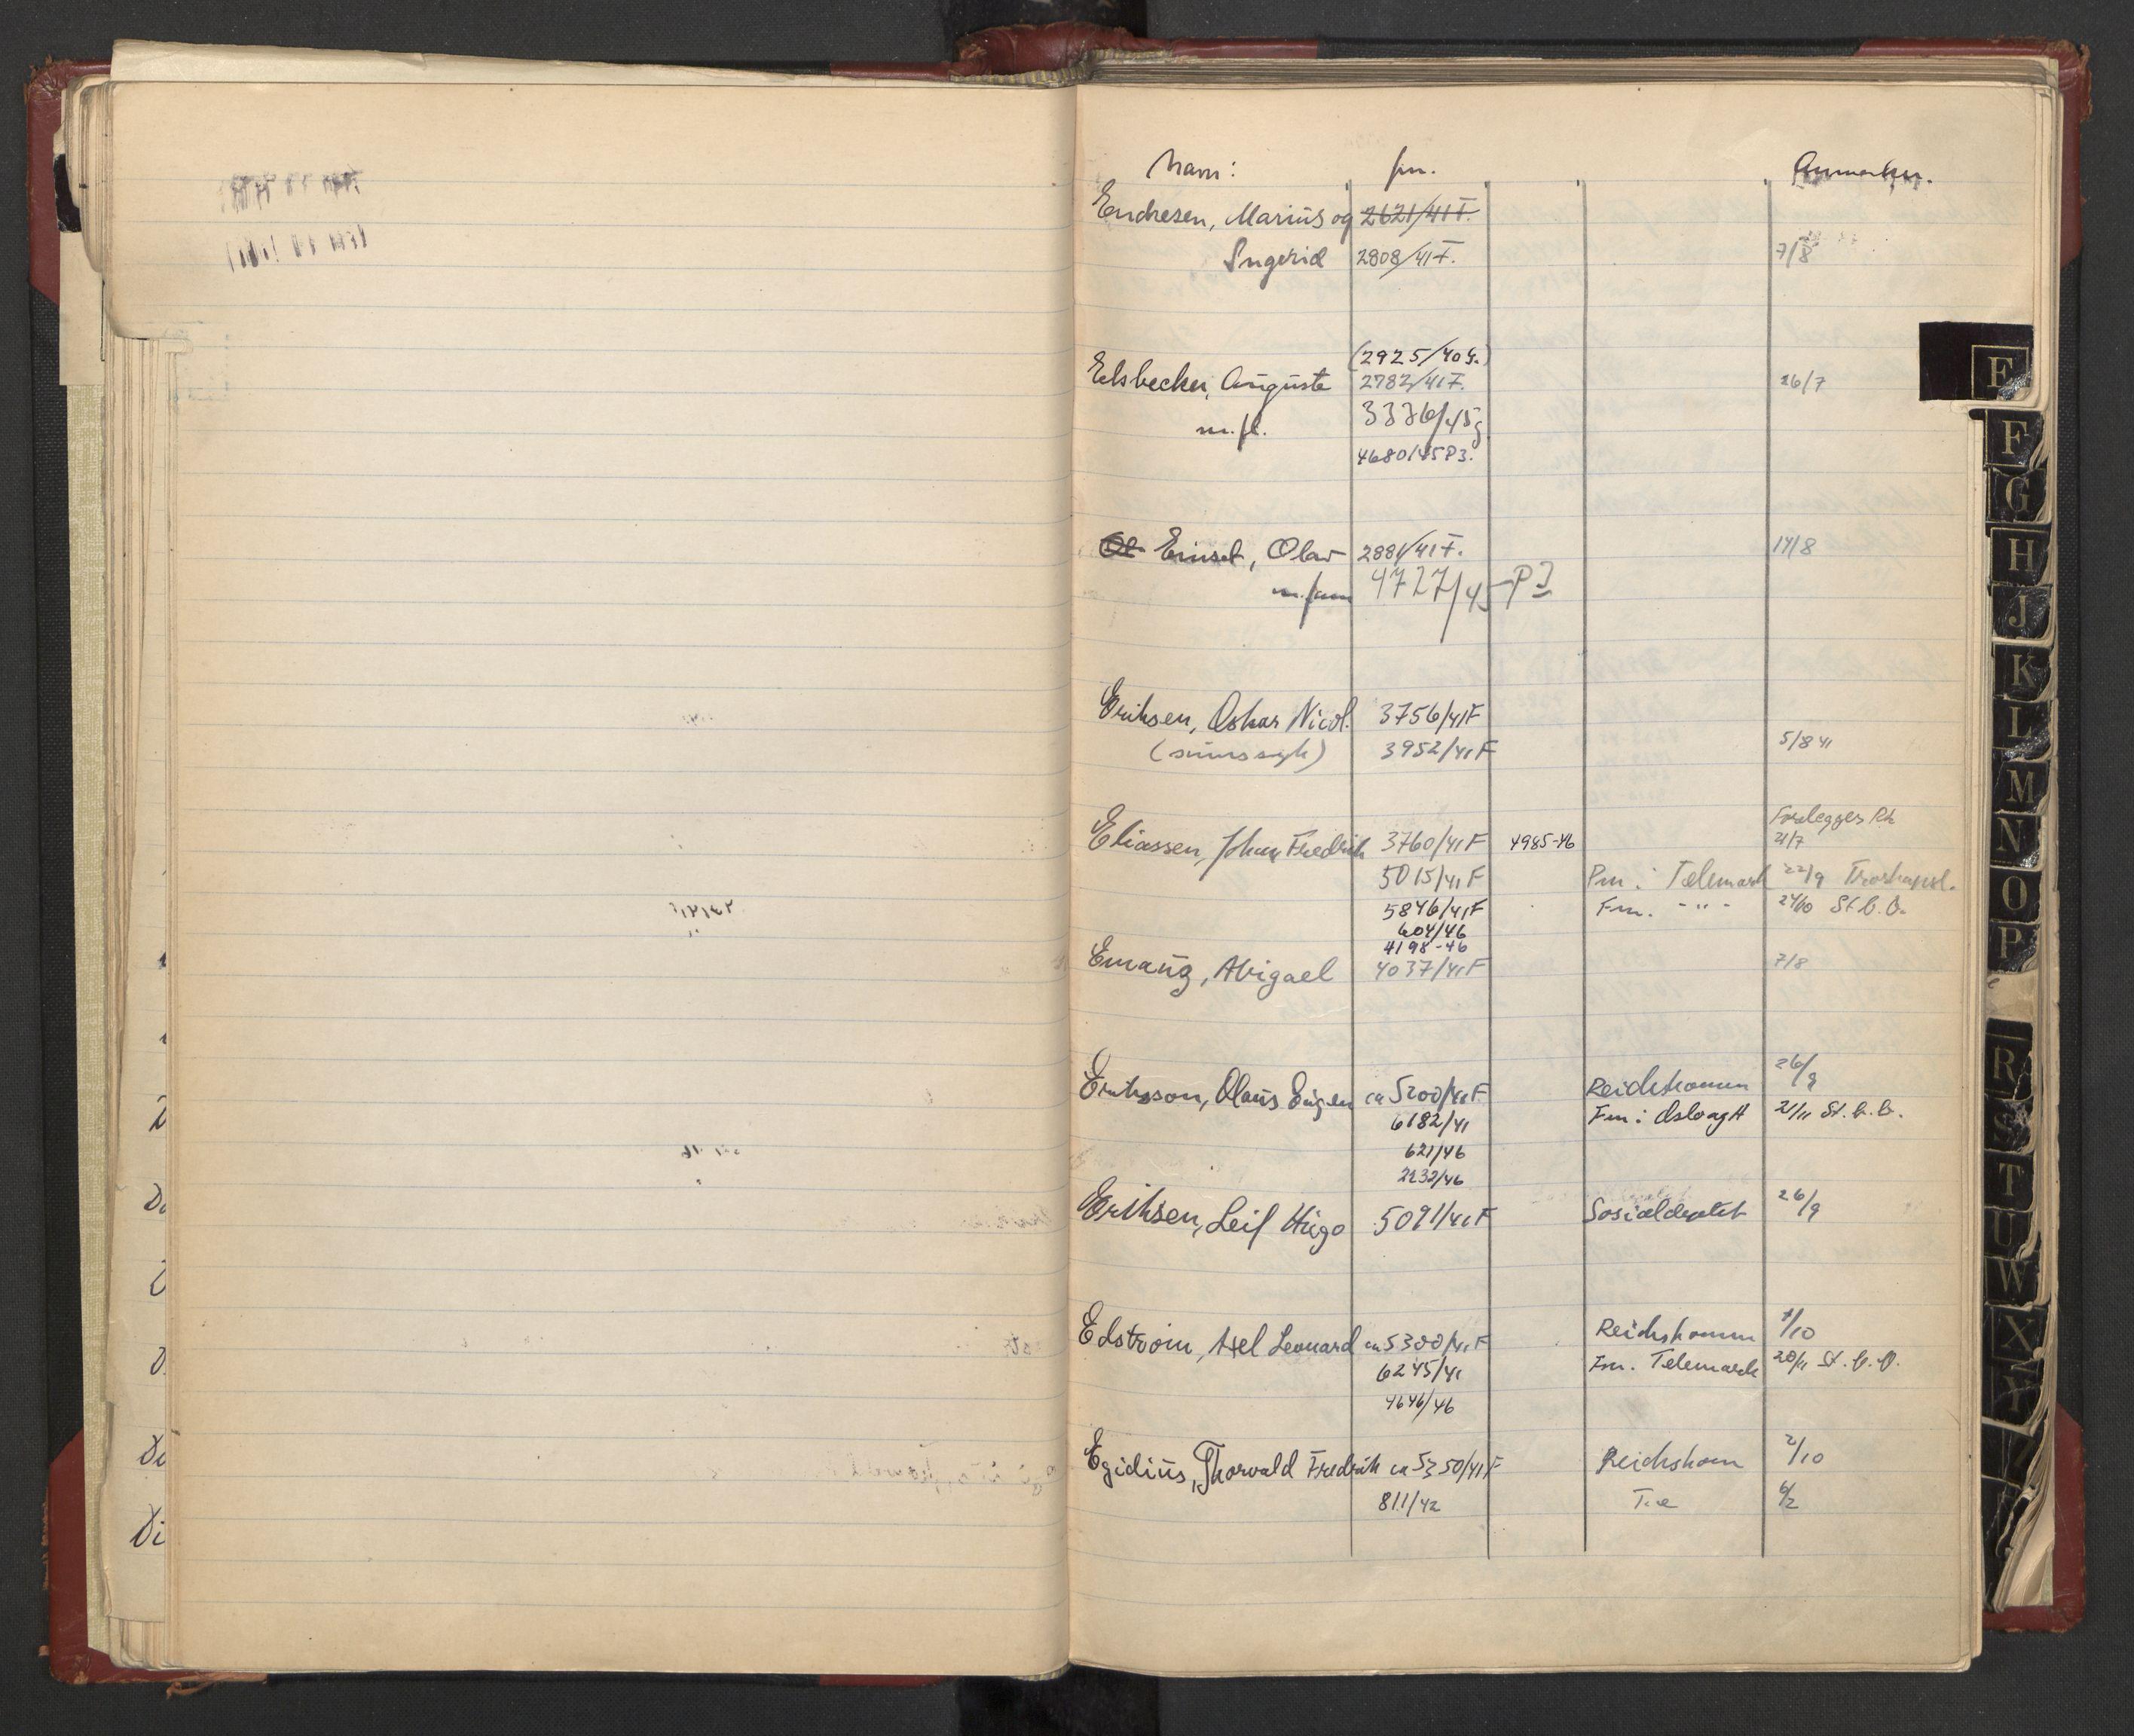 RA, Justisdepartementet, 3. politikontor P3, C/Cc/L0002: Journalregister over statsborgersaker, 1940-1946, s. 22